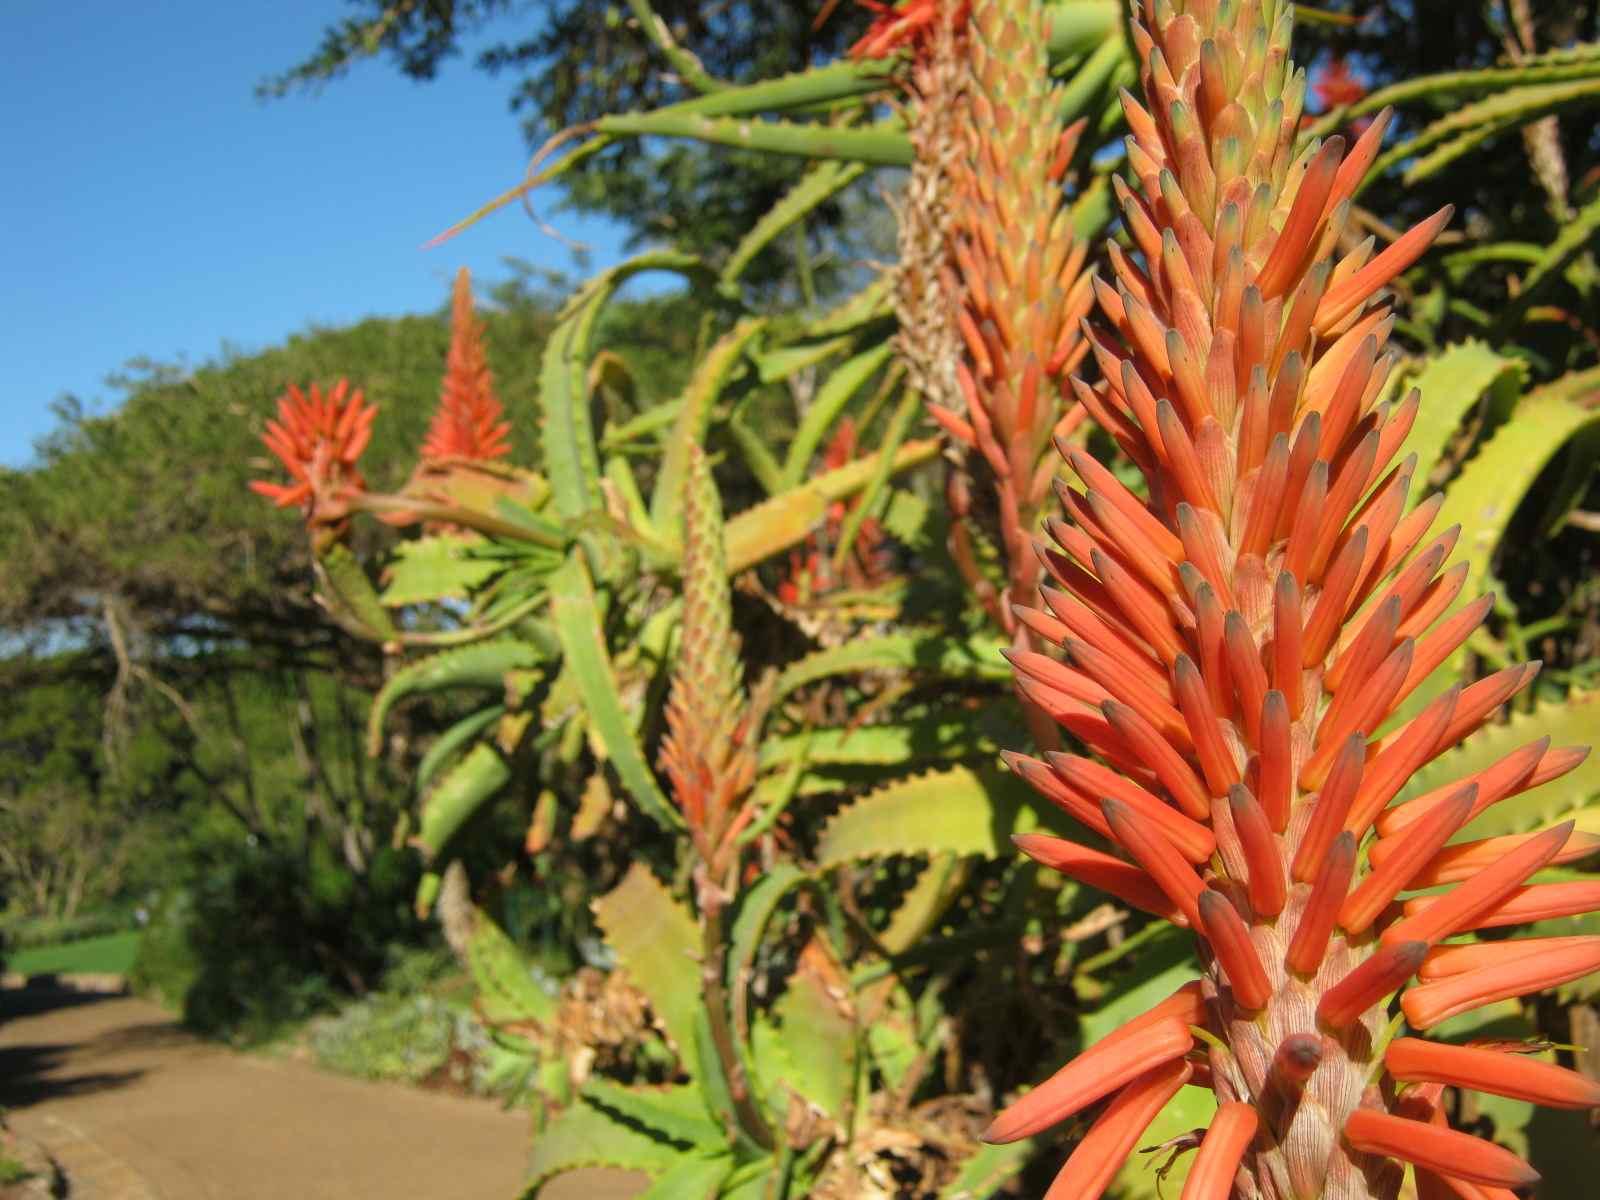 Aloe arboresens tolerates semi shade but loves heat and light